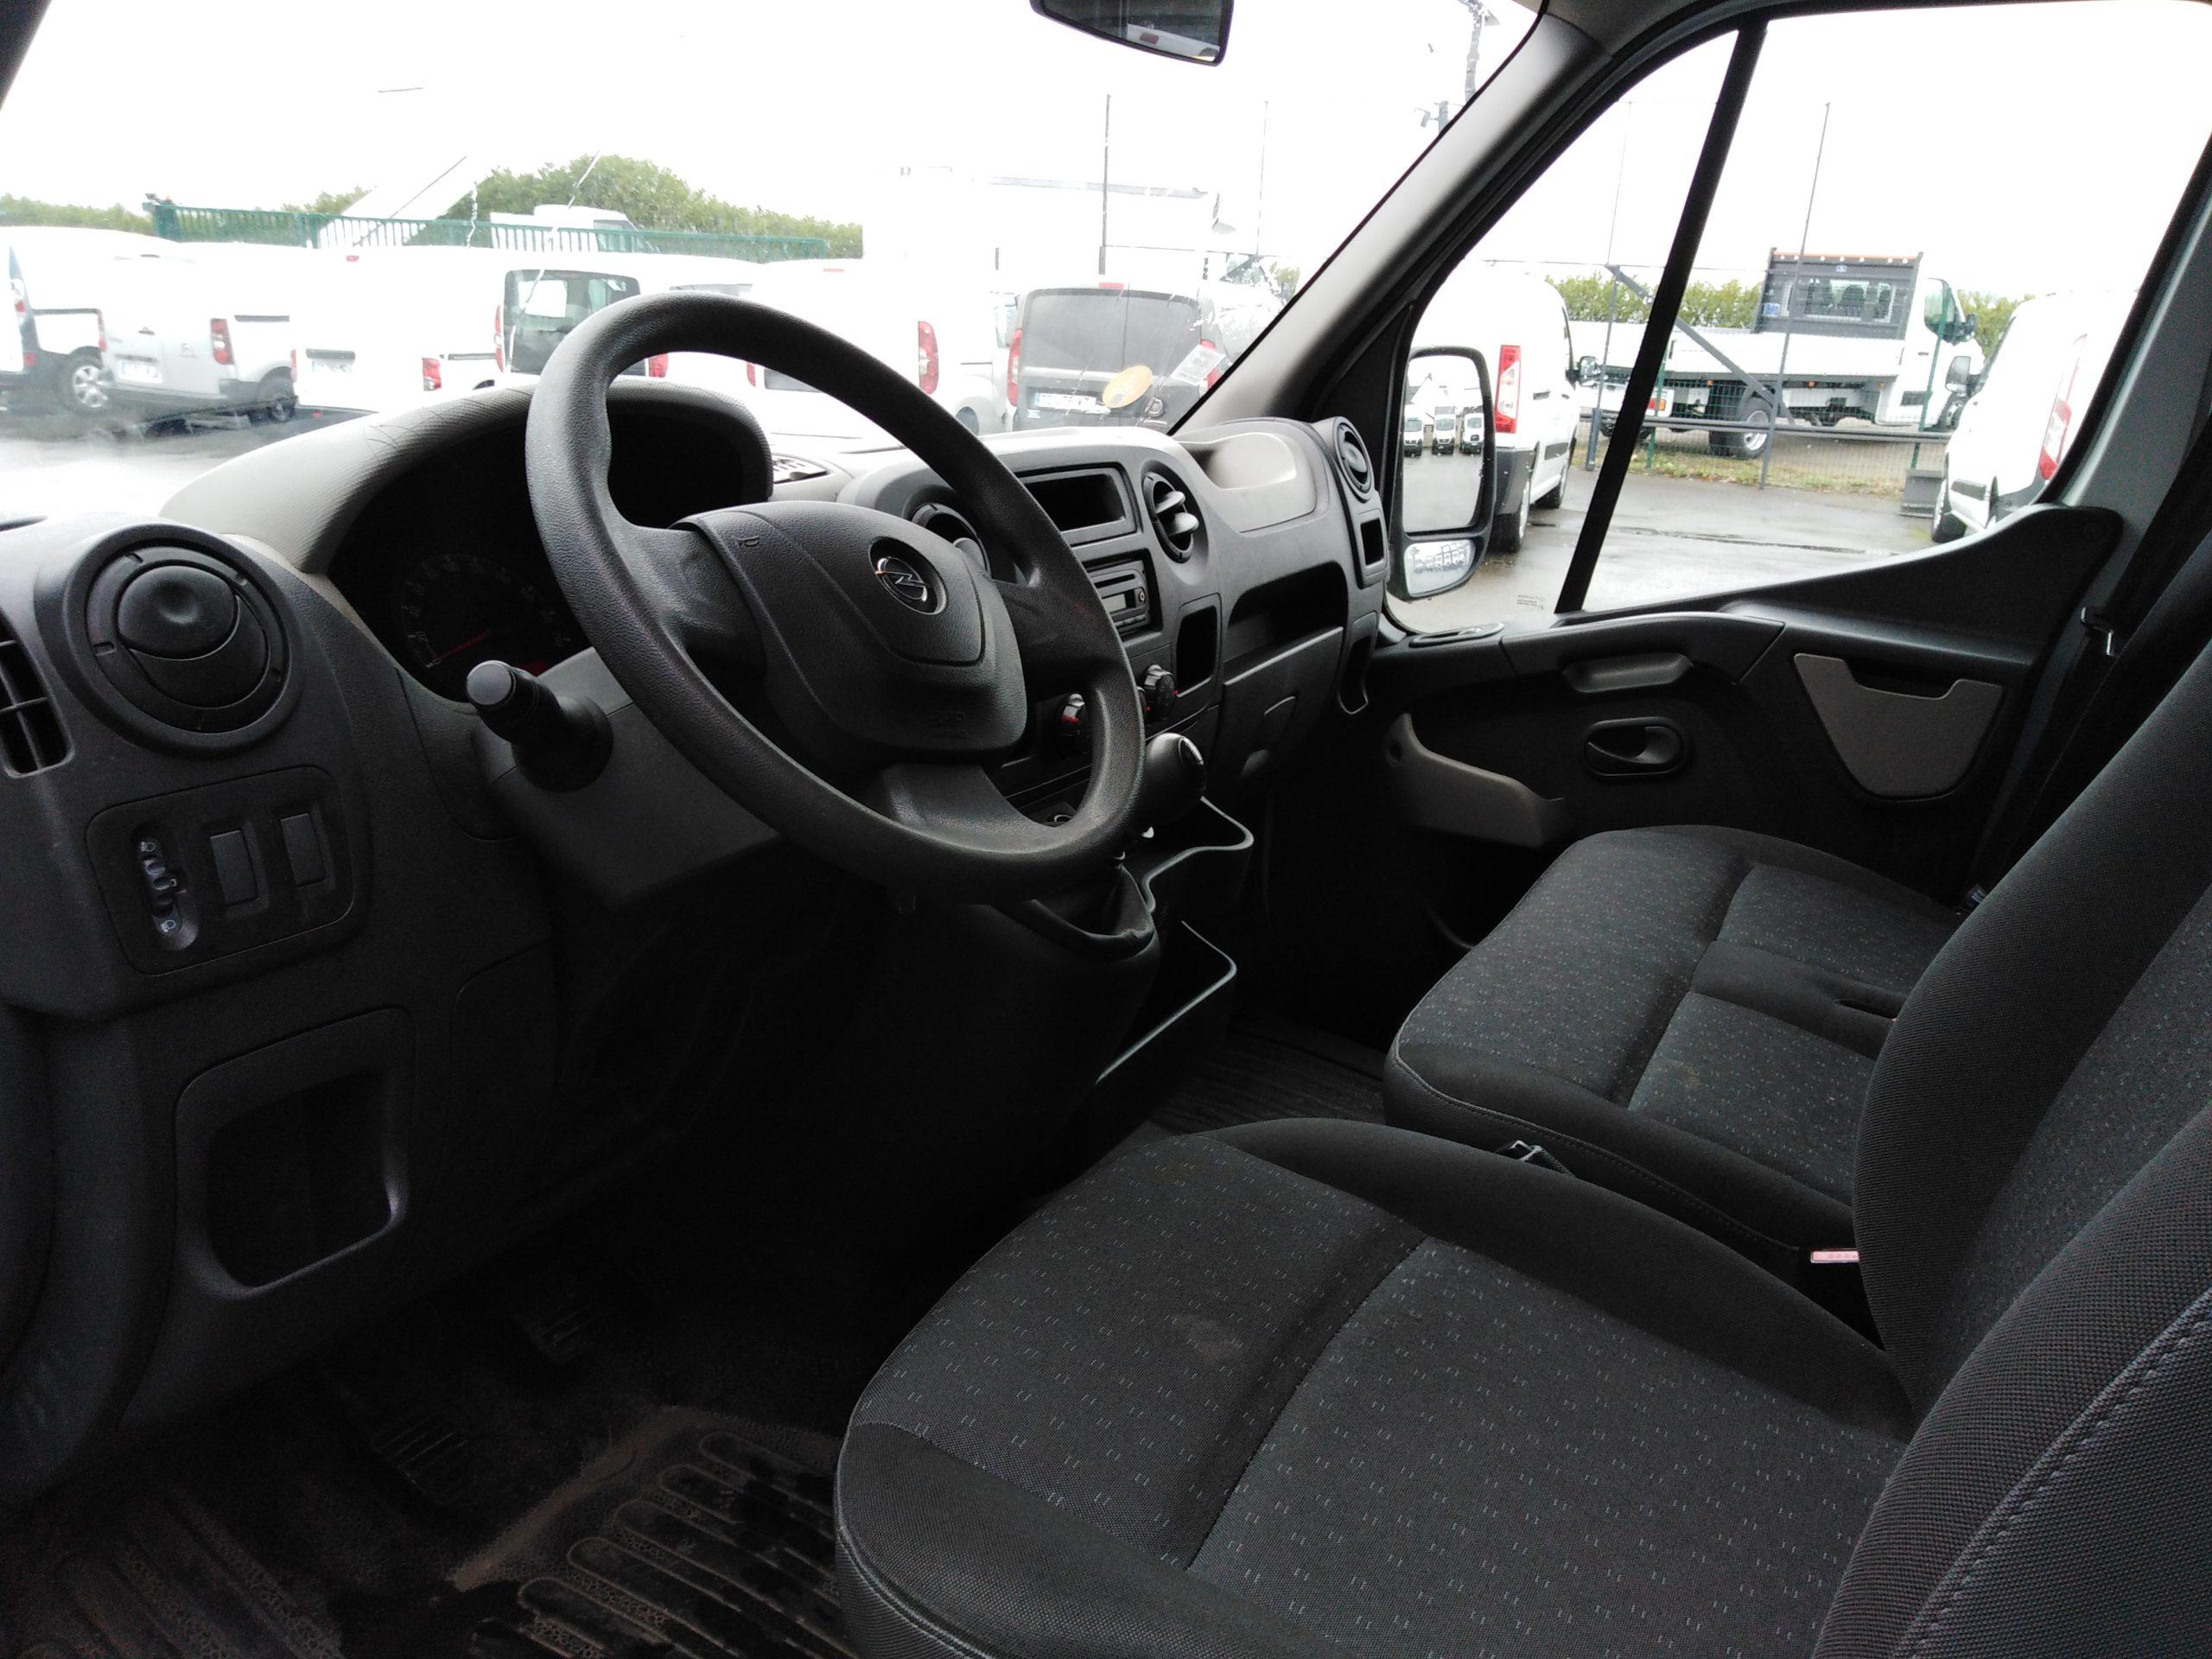 Location d'un utilitaire fourgon à caisse grand volume - Opel Movano 20m3 - Vue5